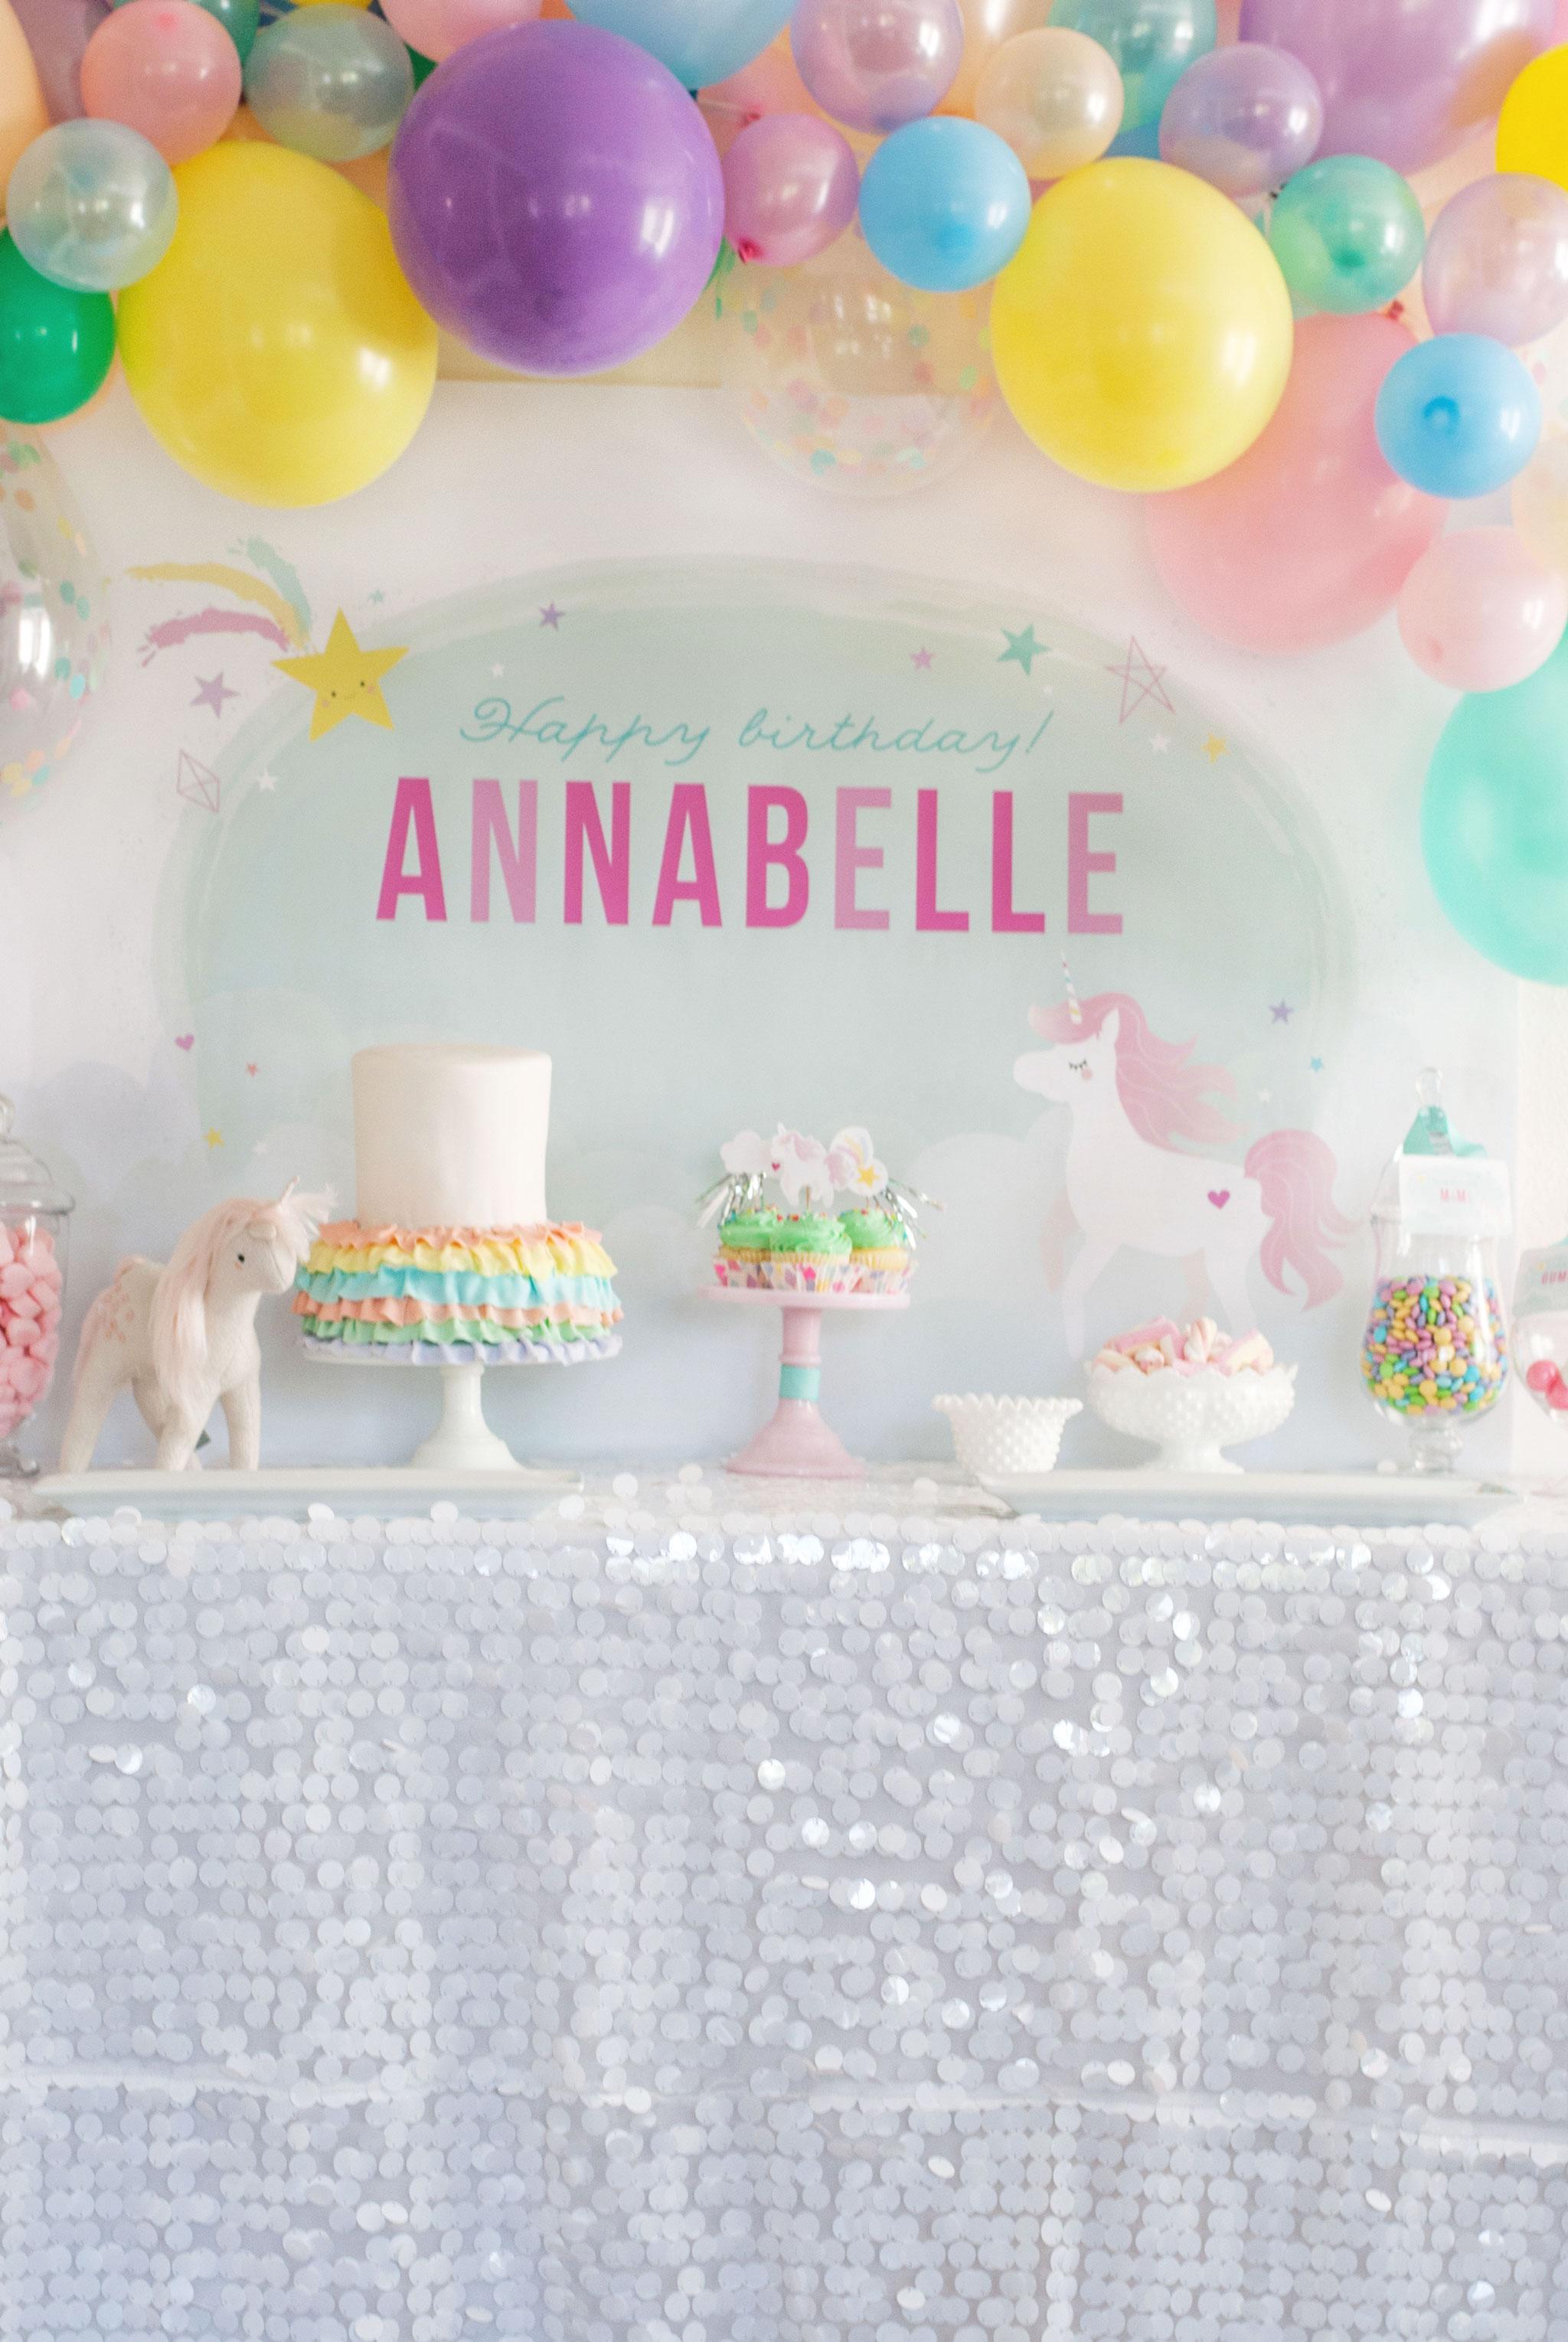 Unicorn Candy Table Ideas : unicorn, candy, table, ideas, Magical, Unicorn, Birthday, Party, Project, Nursery